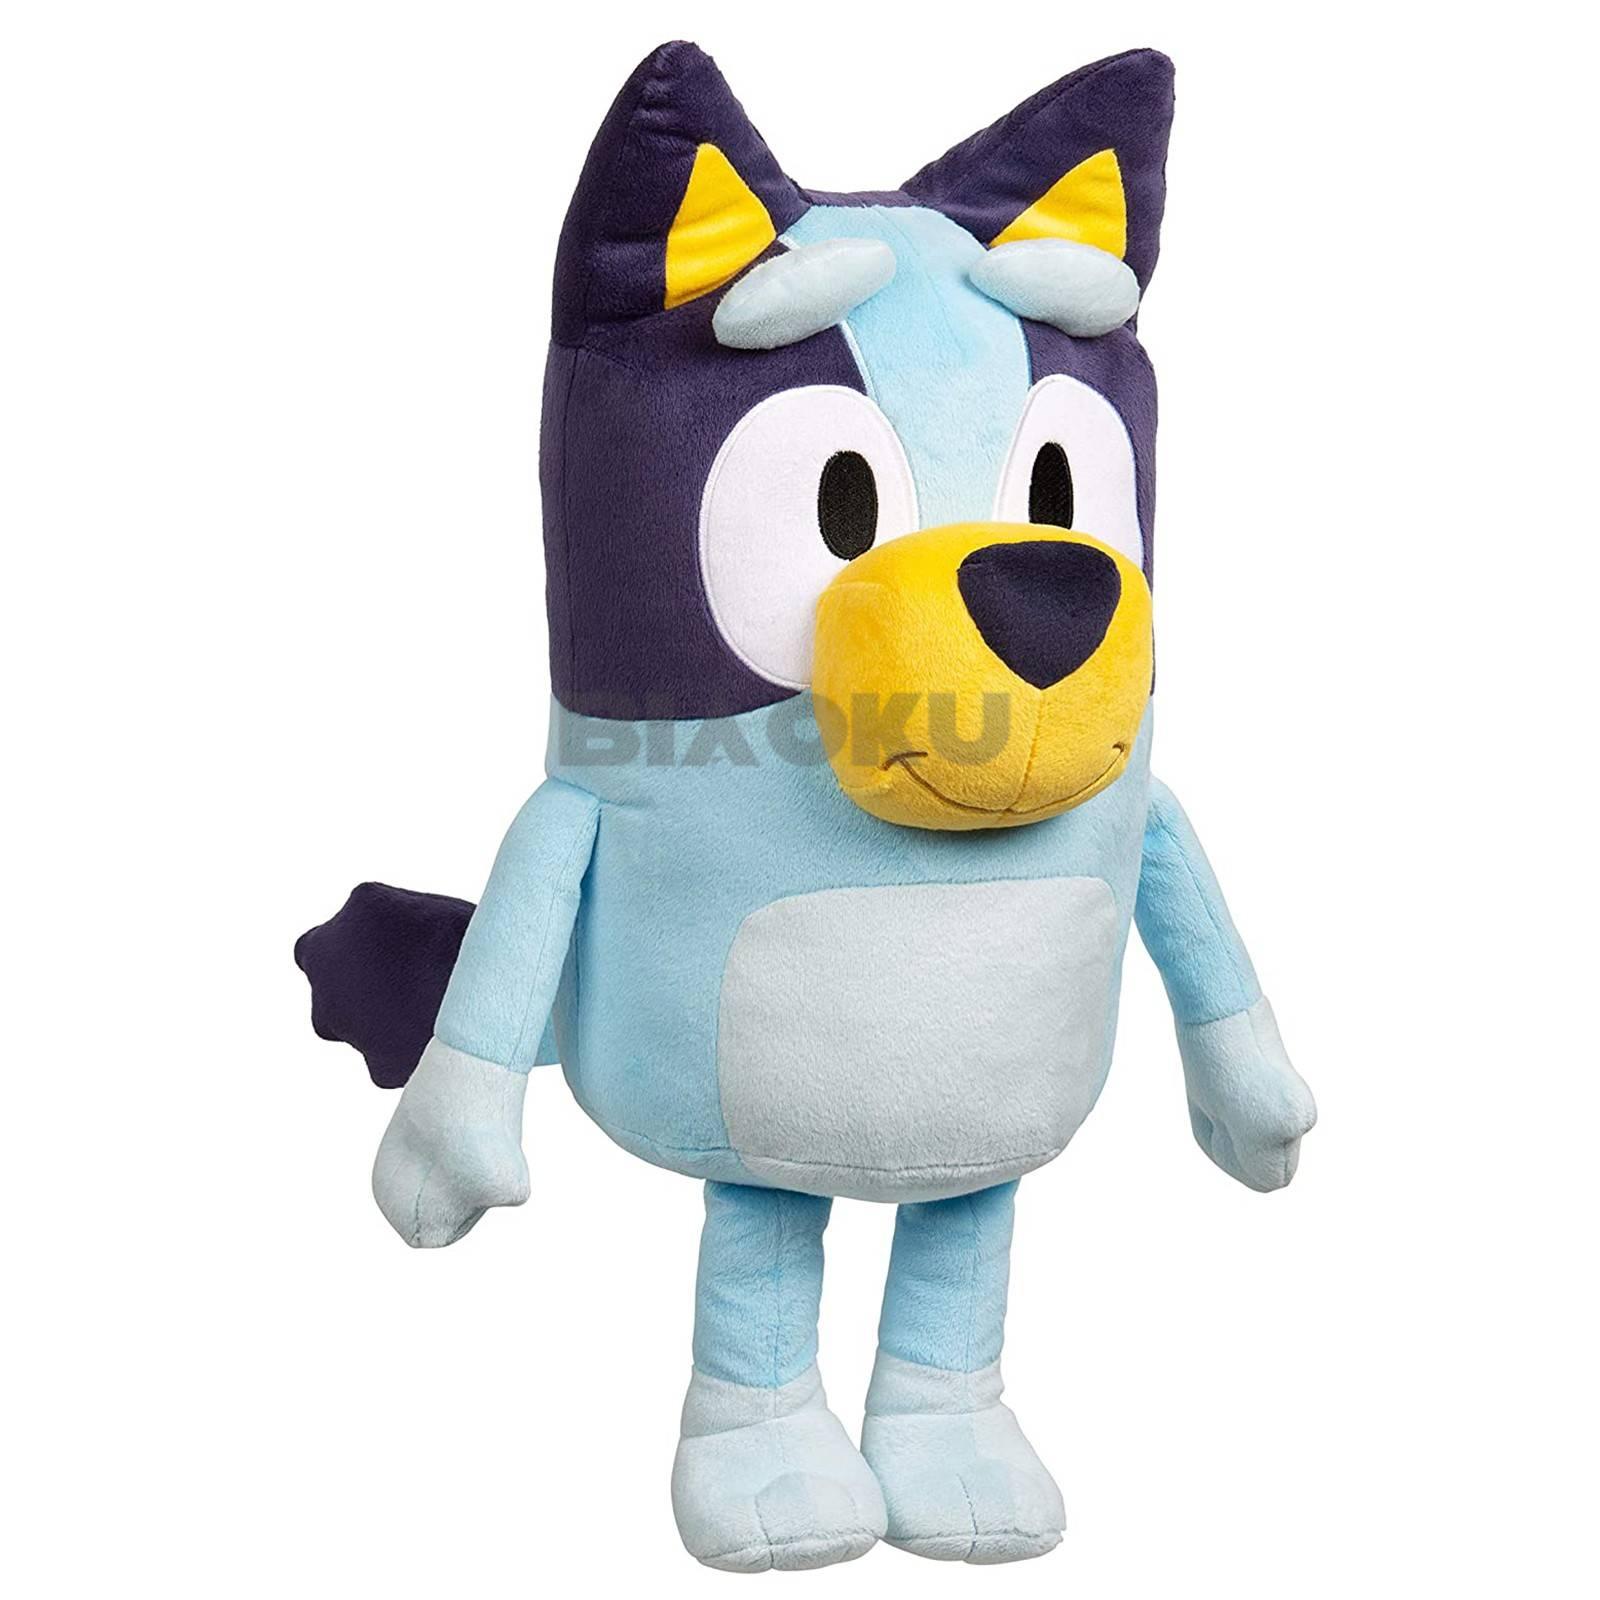 【HOT SALE】28cm Bluey Kids Soft Gift Children Cute Plush Toys Doggy Pupets Doll Soft Cuty Stuffed Toy Bluey Bingo Plush...